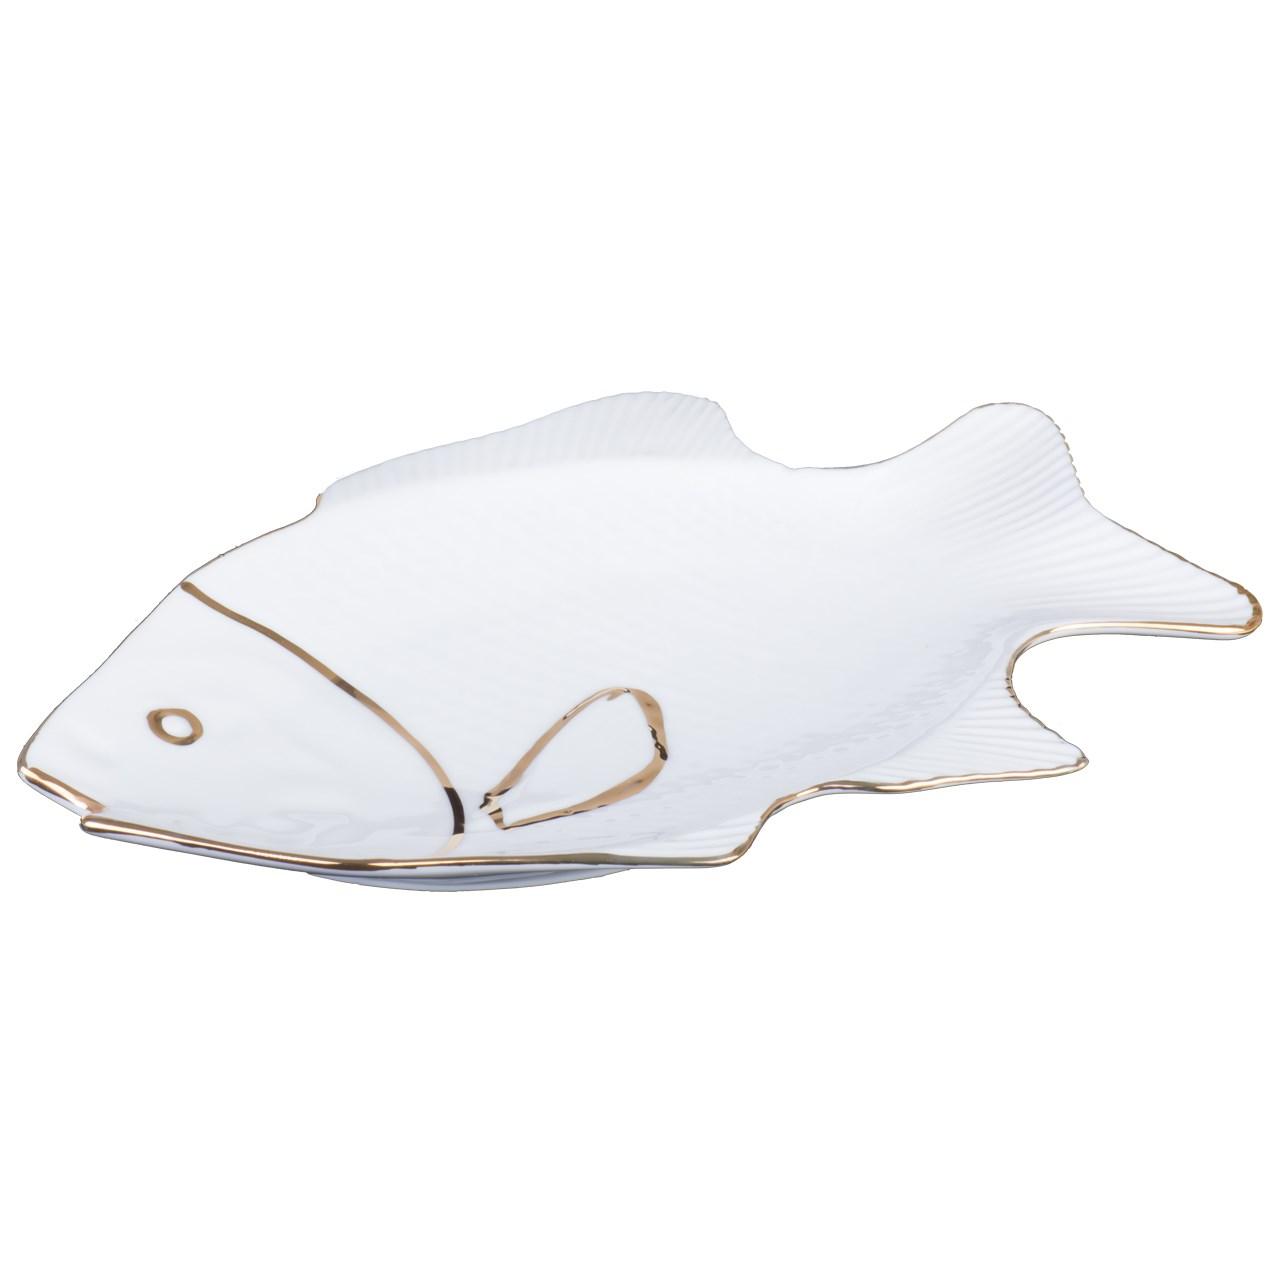 دیس لیمون چینی طرح ماهی دو خط طلا سایز بزرگ